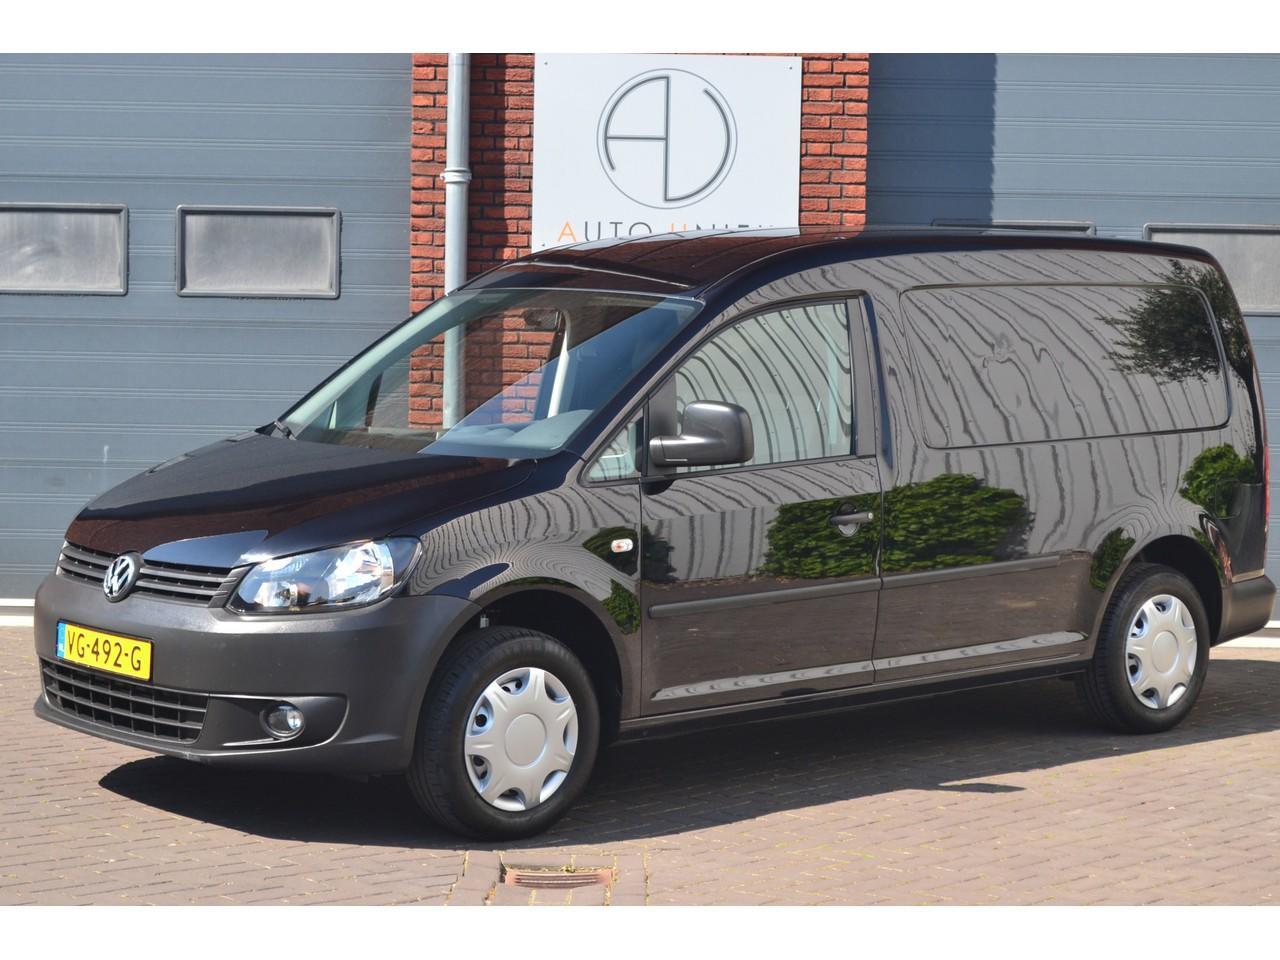 Volkswagen Caddy 1.6 tdi maxi bmt airco, 102pk, trekhaak, 76.512km nap